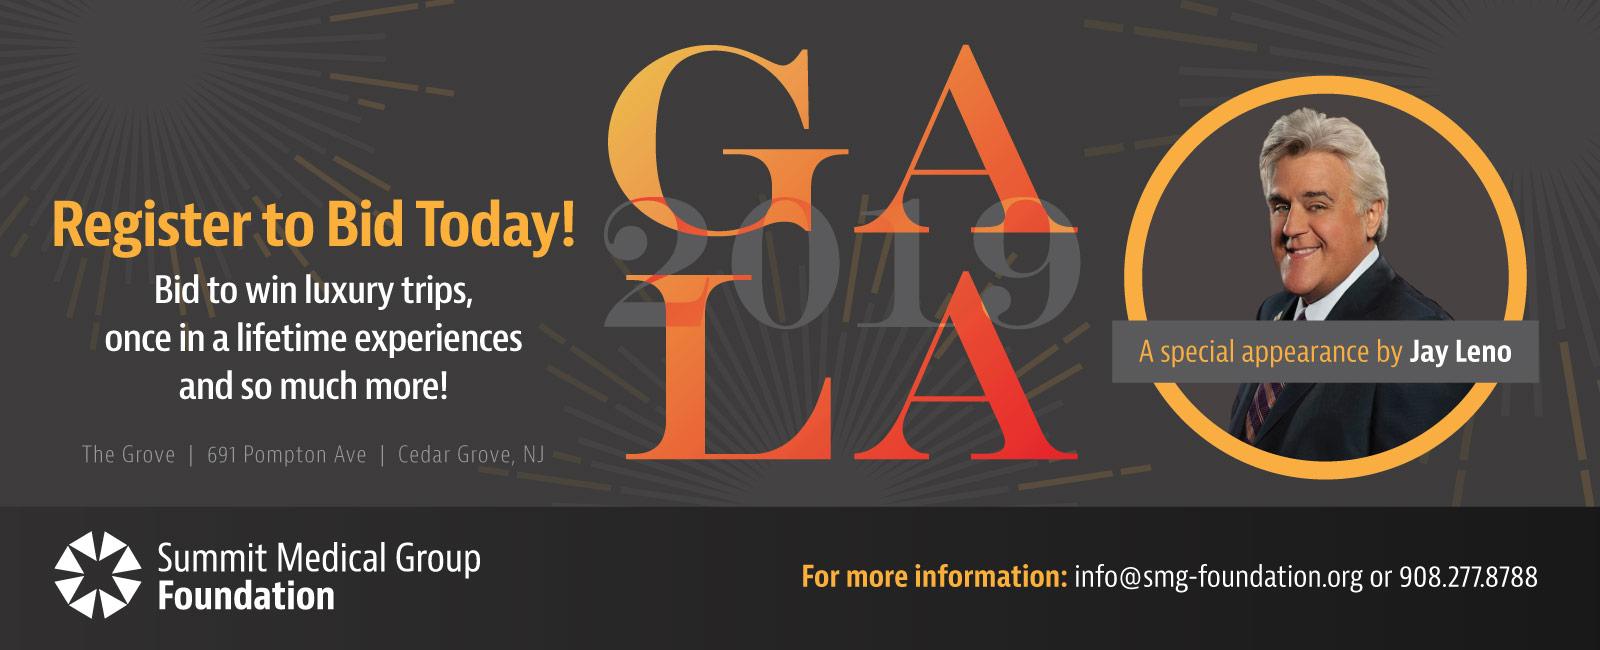 Gala 2019, special appearance by Jay Leno